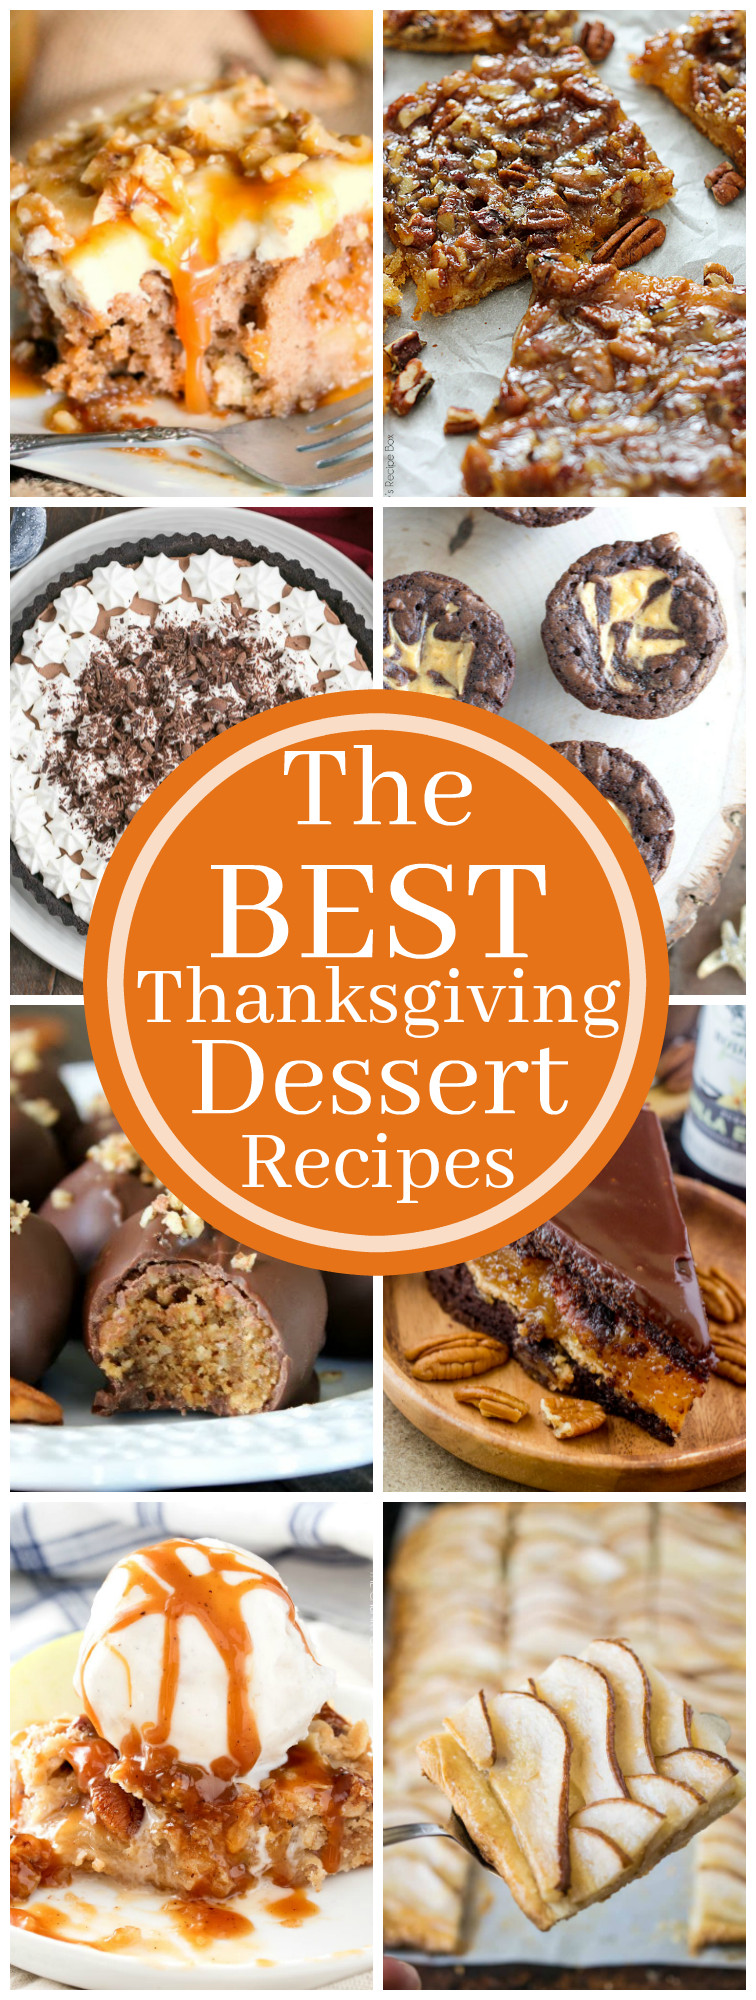 Thanksgiving Dessert Ideas  The Best Thanksgiving Desserts Savory Experiments